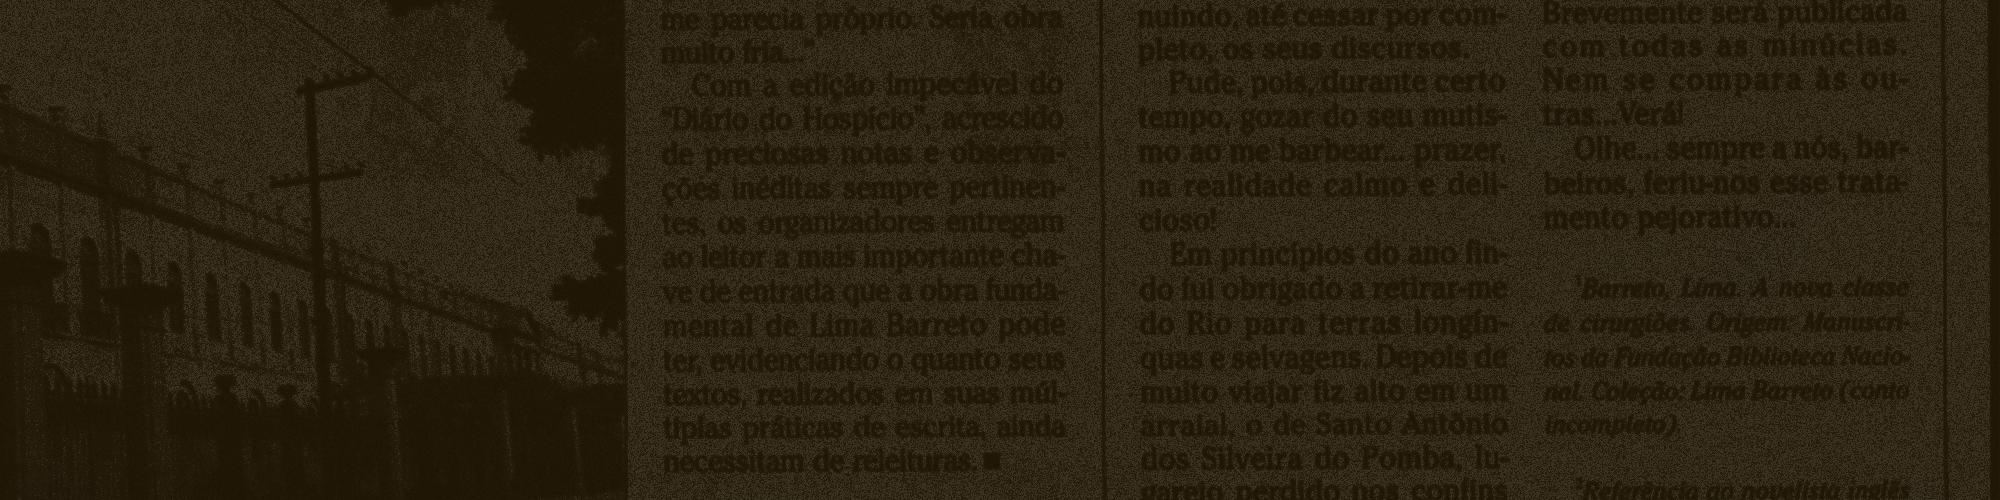 Jornal de cronicas capa padrim